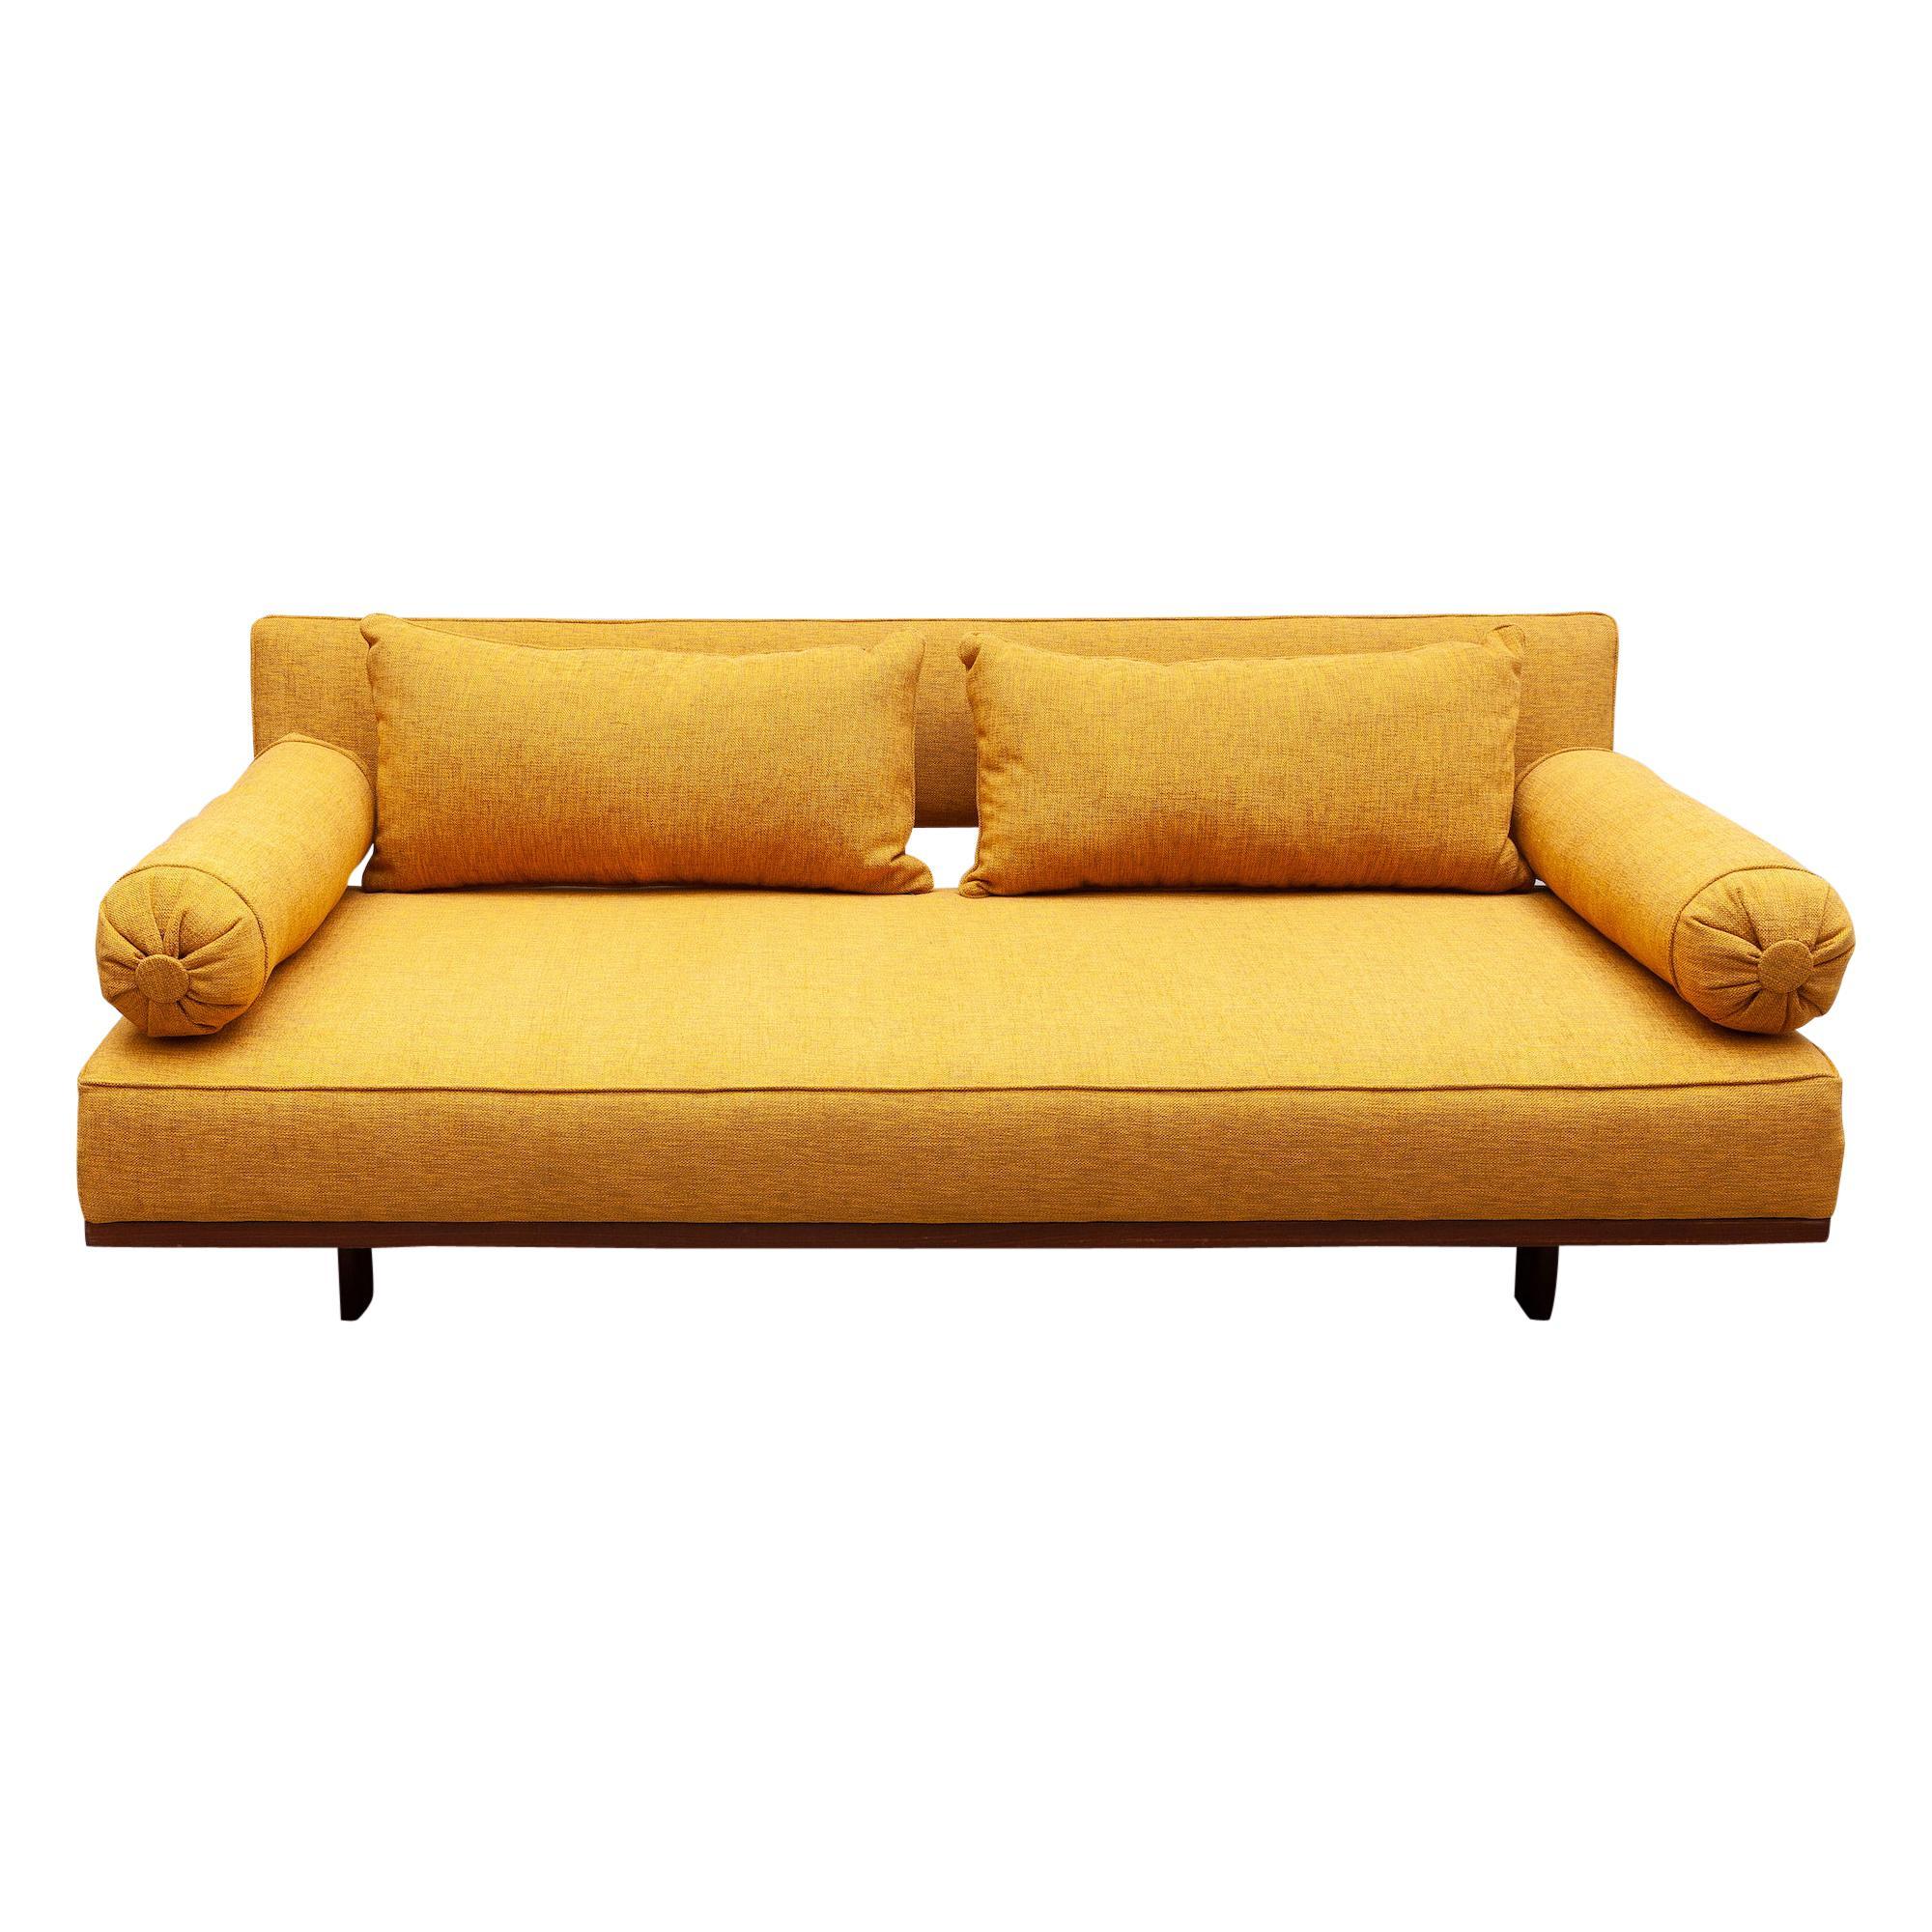 Rare Modern Daybed, Sofa by Karl-Erik Ekselius, Sweden, 1960s